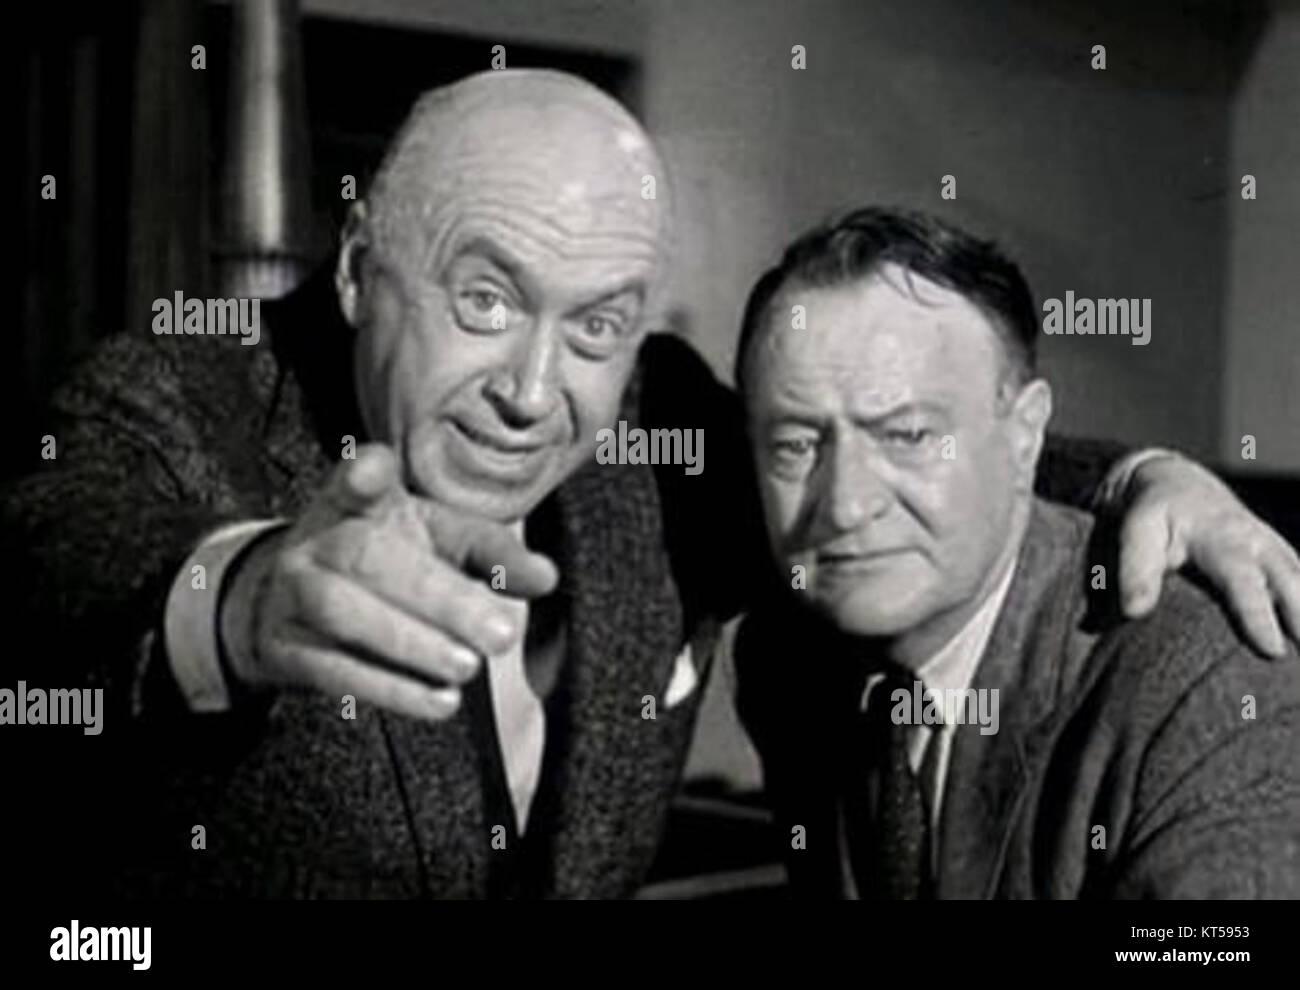 Otto Preminger Stockfotos & Otto Preminger Bilder - Alamy